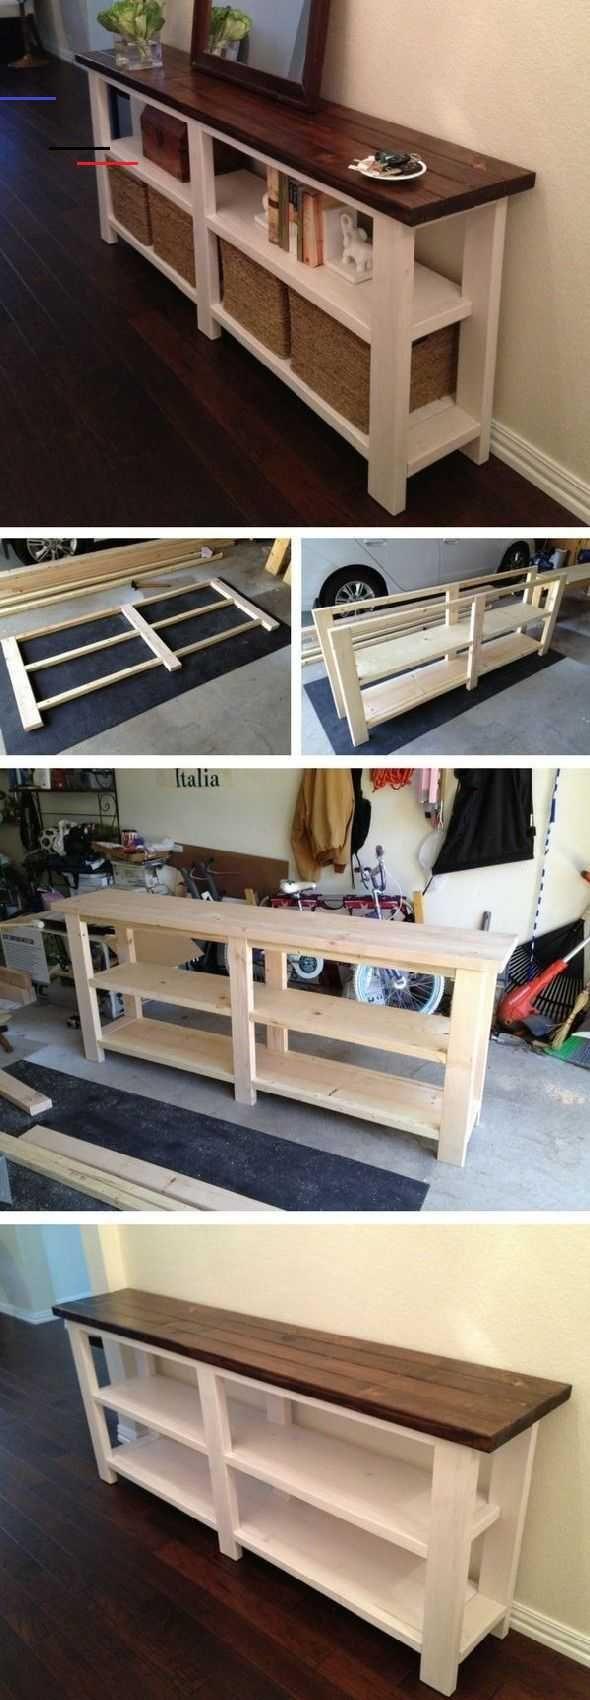 15 Beste erstaunliche DIY Möbelstück Ideen zu stehlen amazing DIY Fu 15 Beste erstaunliche DIY Möbelstück Ideen zu stehlen amazing DIY Fu 15  Beste er...